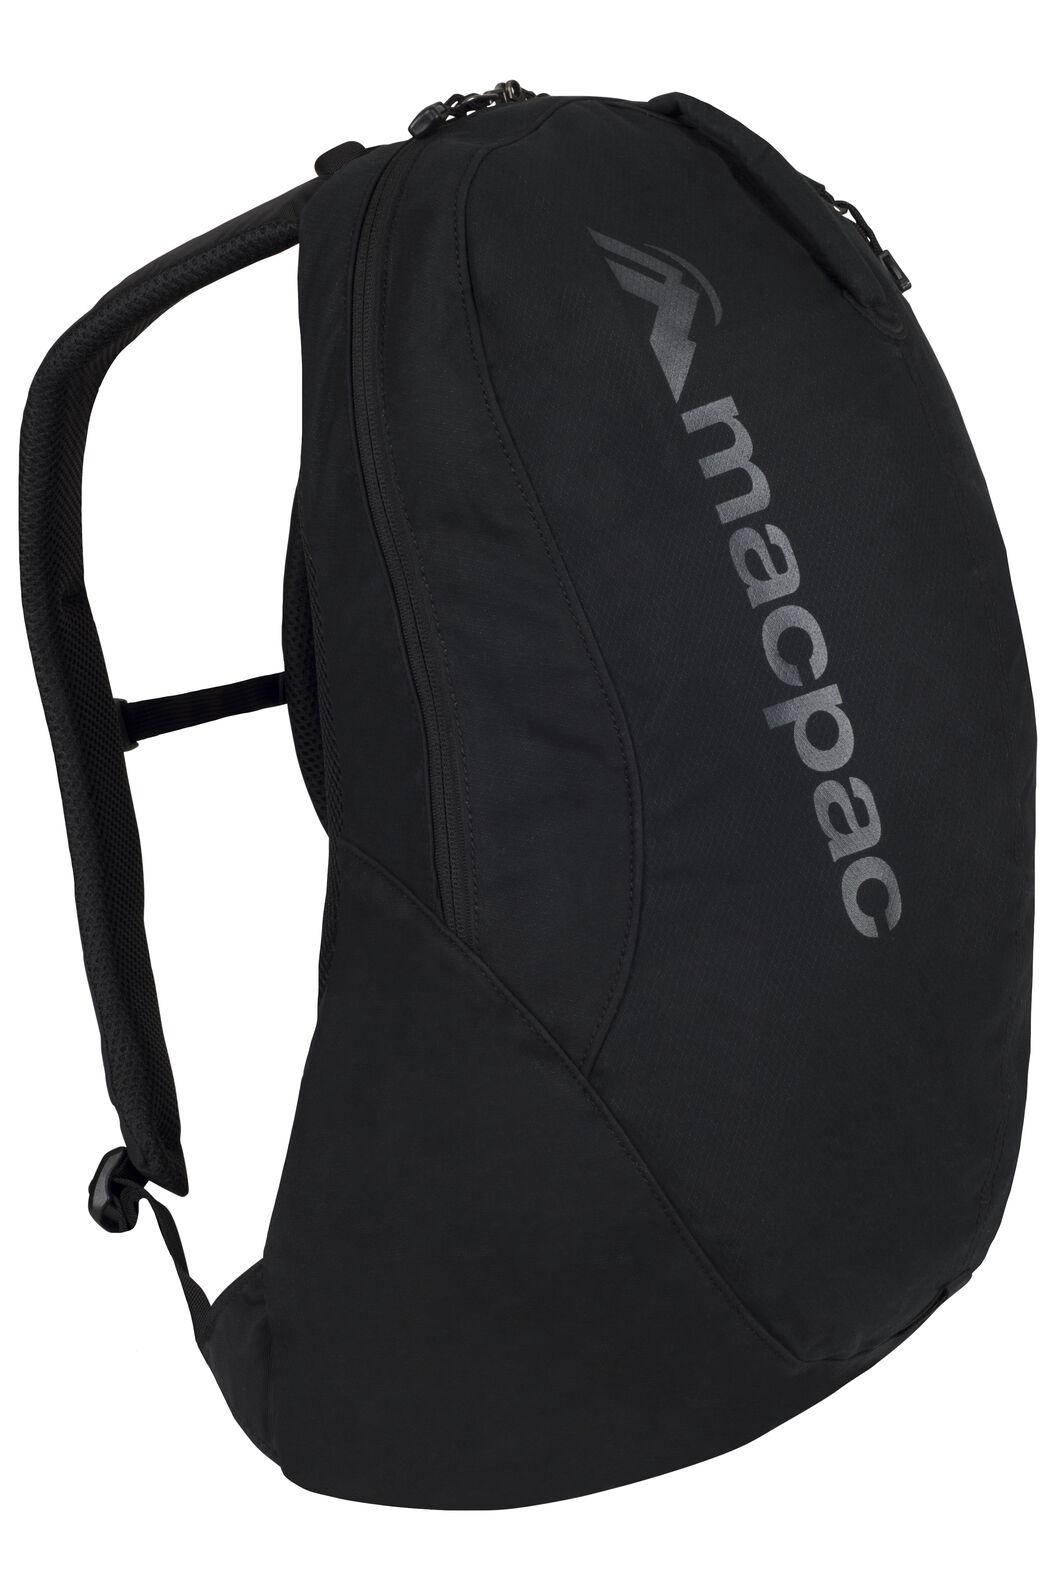 Macpac Kahu 22L AzTec® Pack V2, Black, hi-res